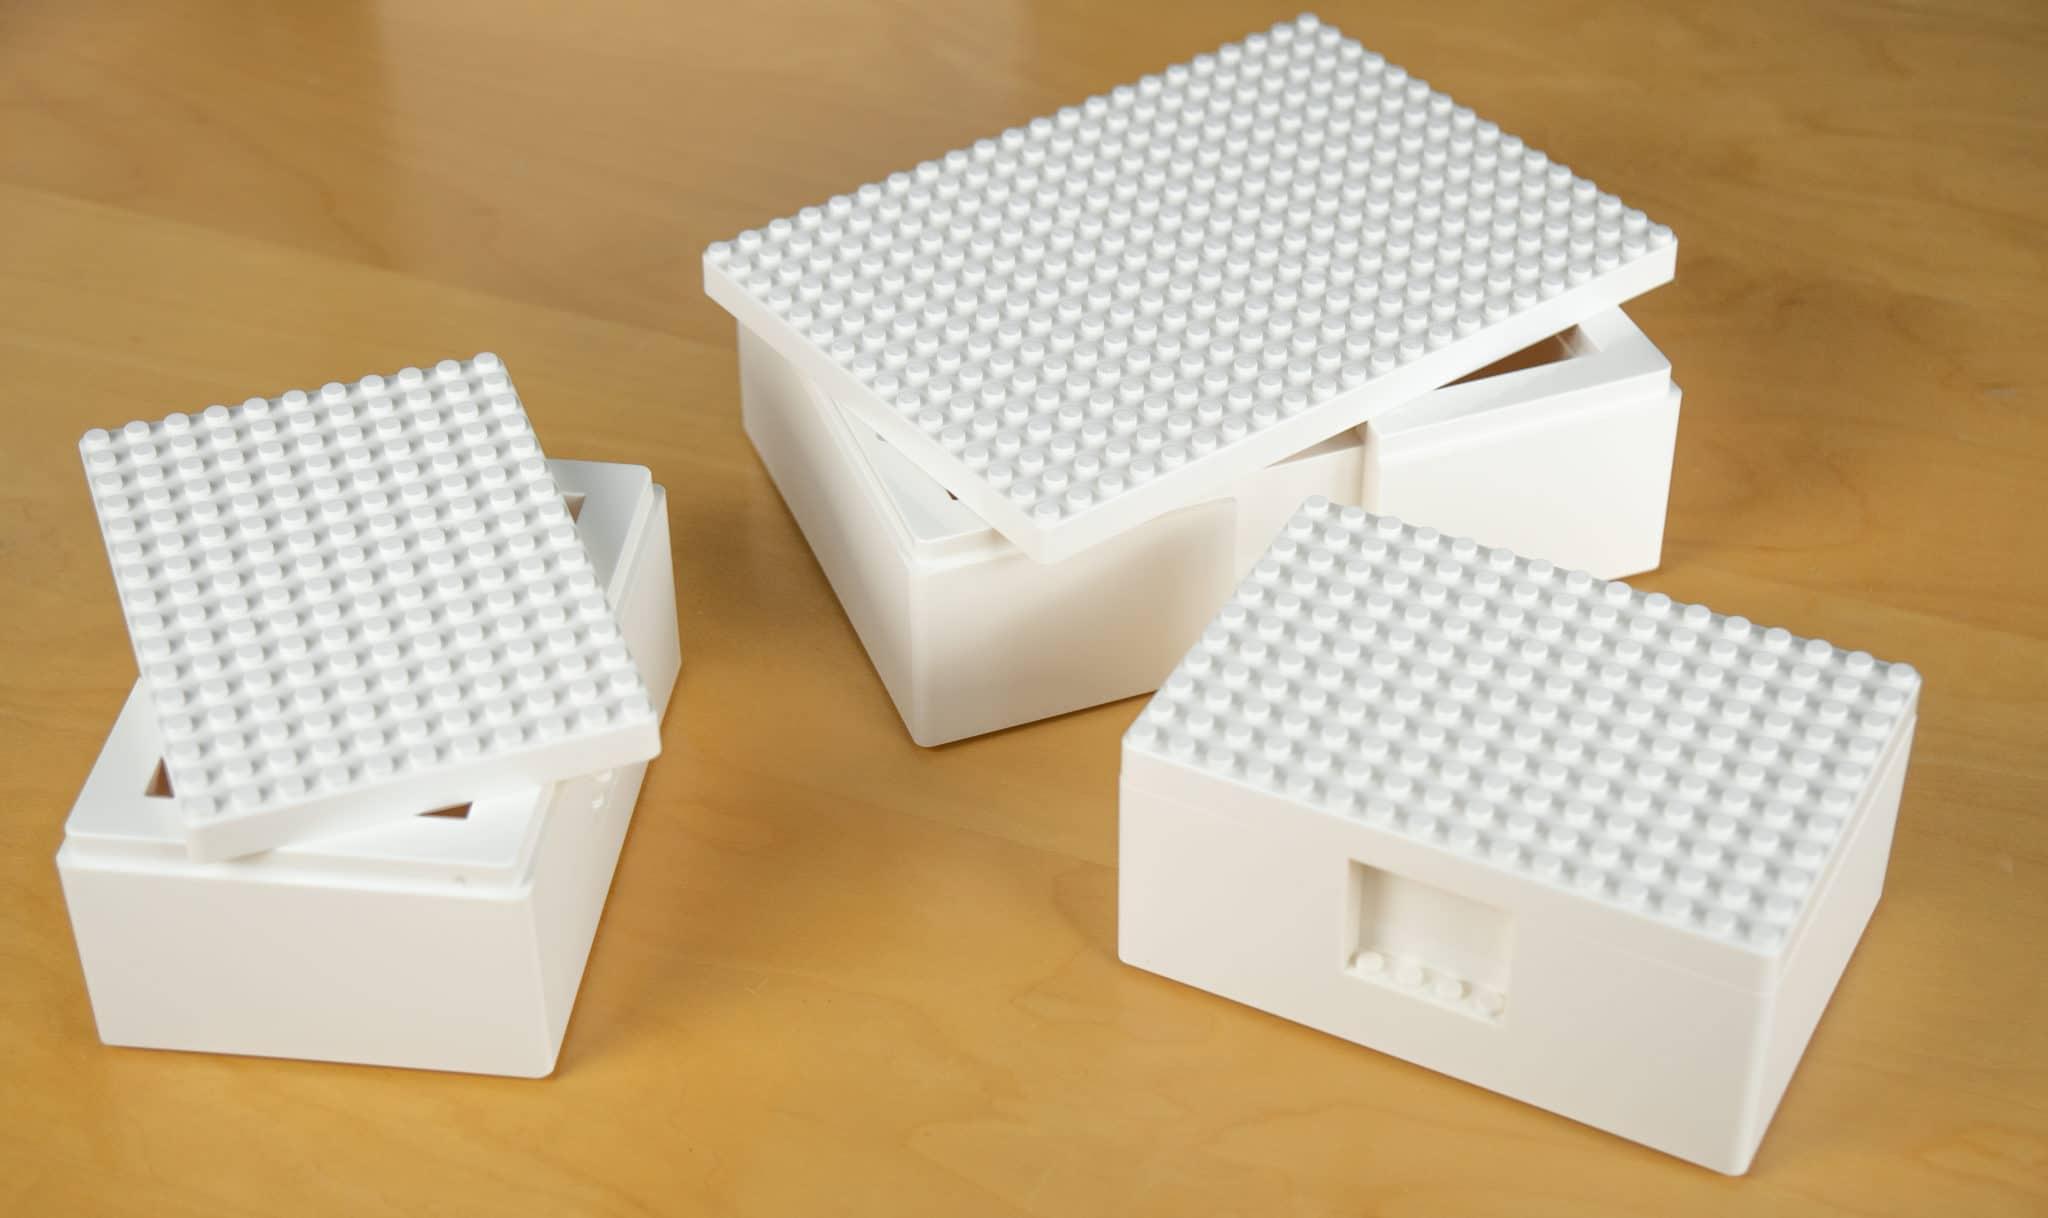 LEGO x IKEA BYGGLEK small boxes